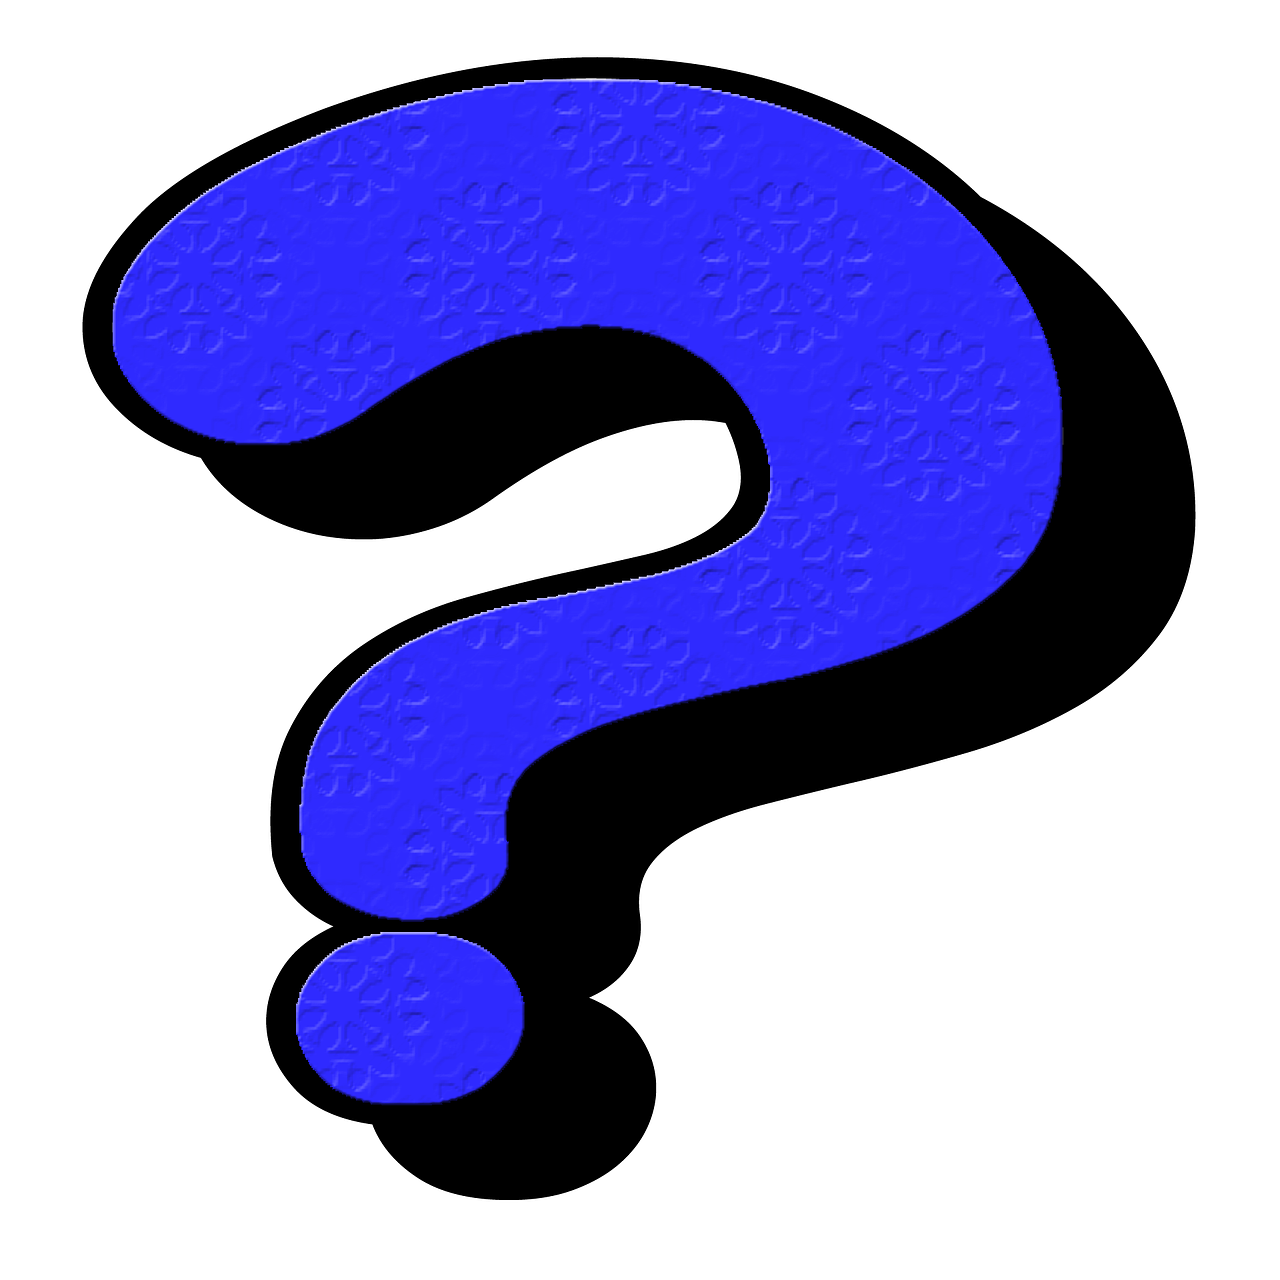 question-606954_1280